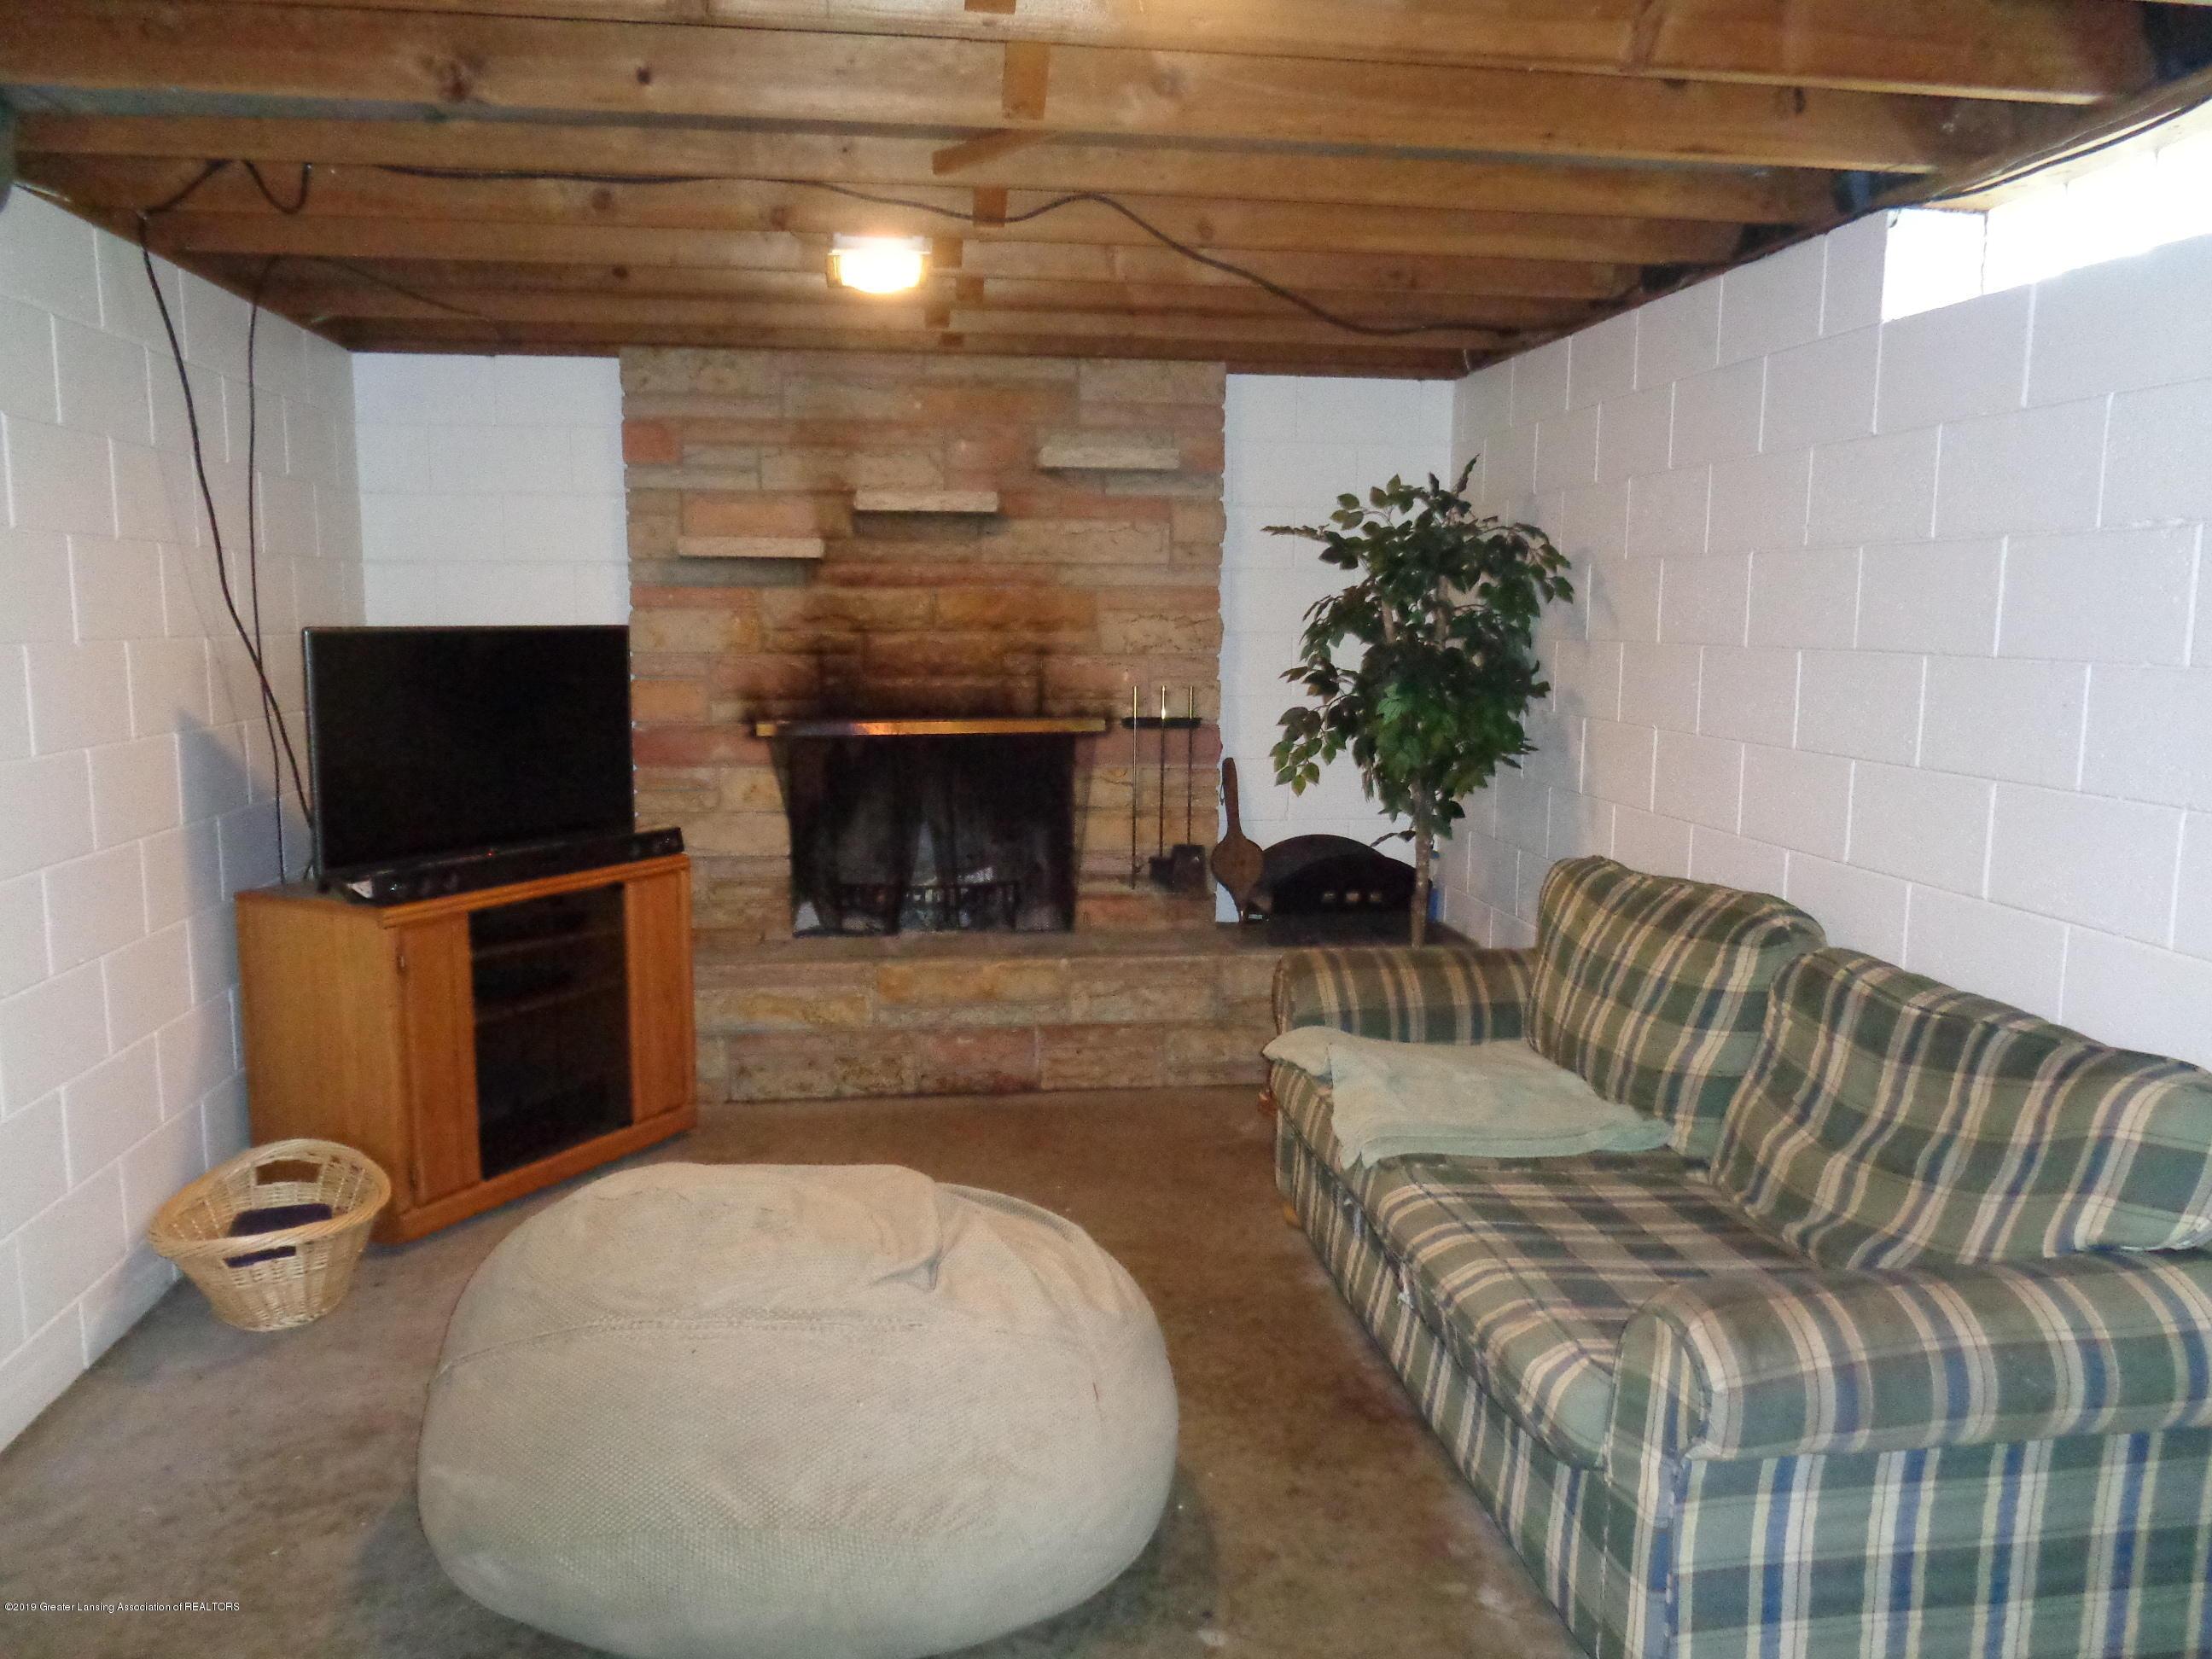 3525 W Kalamazoo St - kalamazoo basement 1 - 15